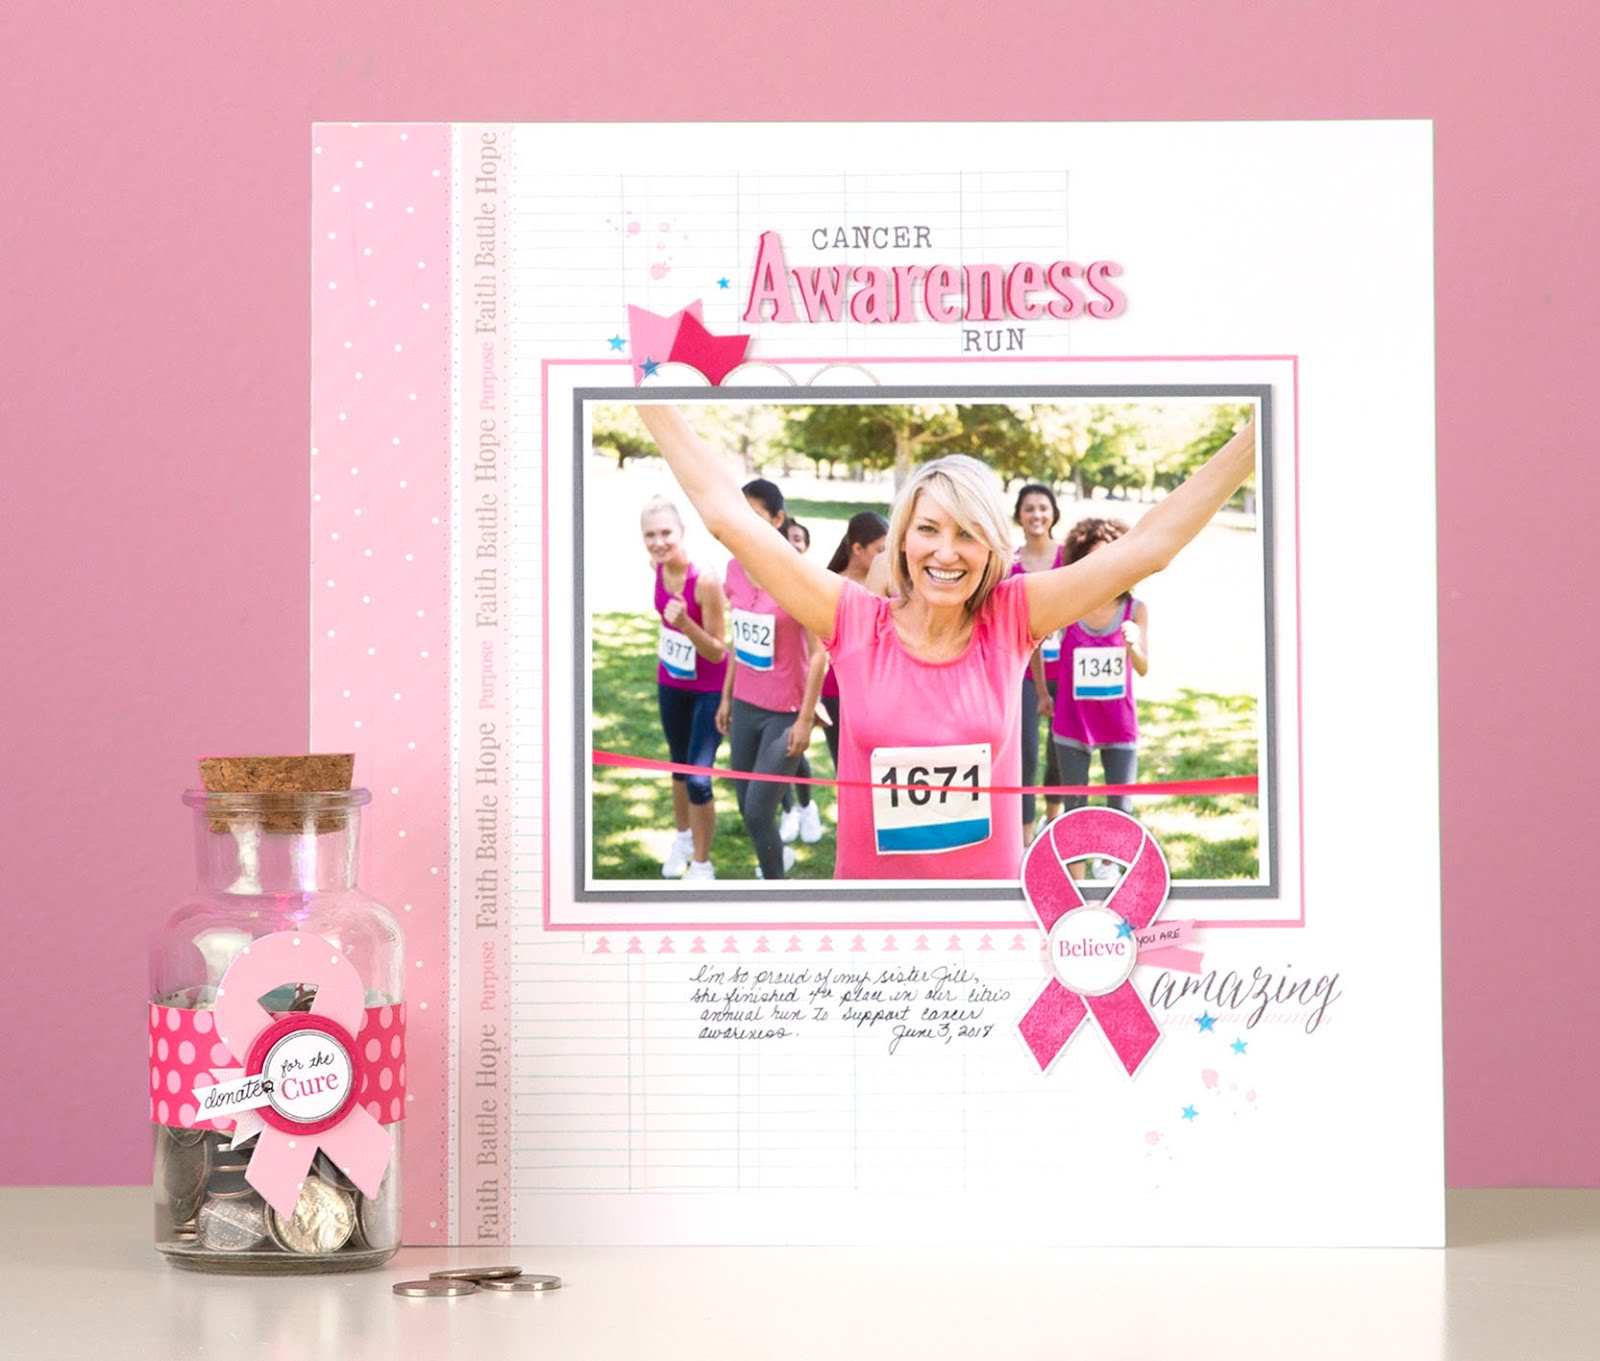 Ribbon Warrior (October Breast Cancer Awaremess)